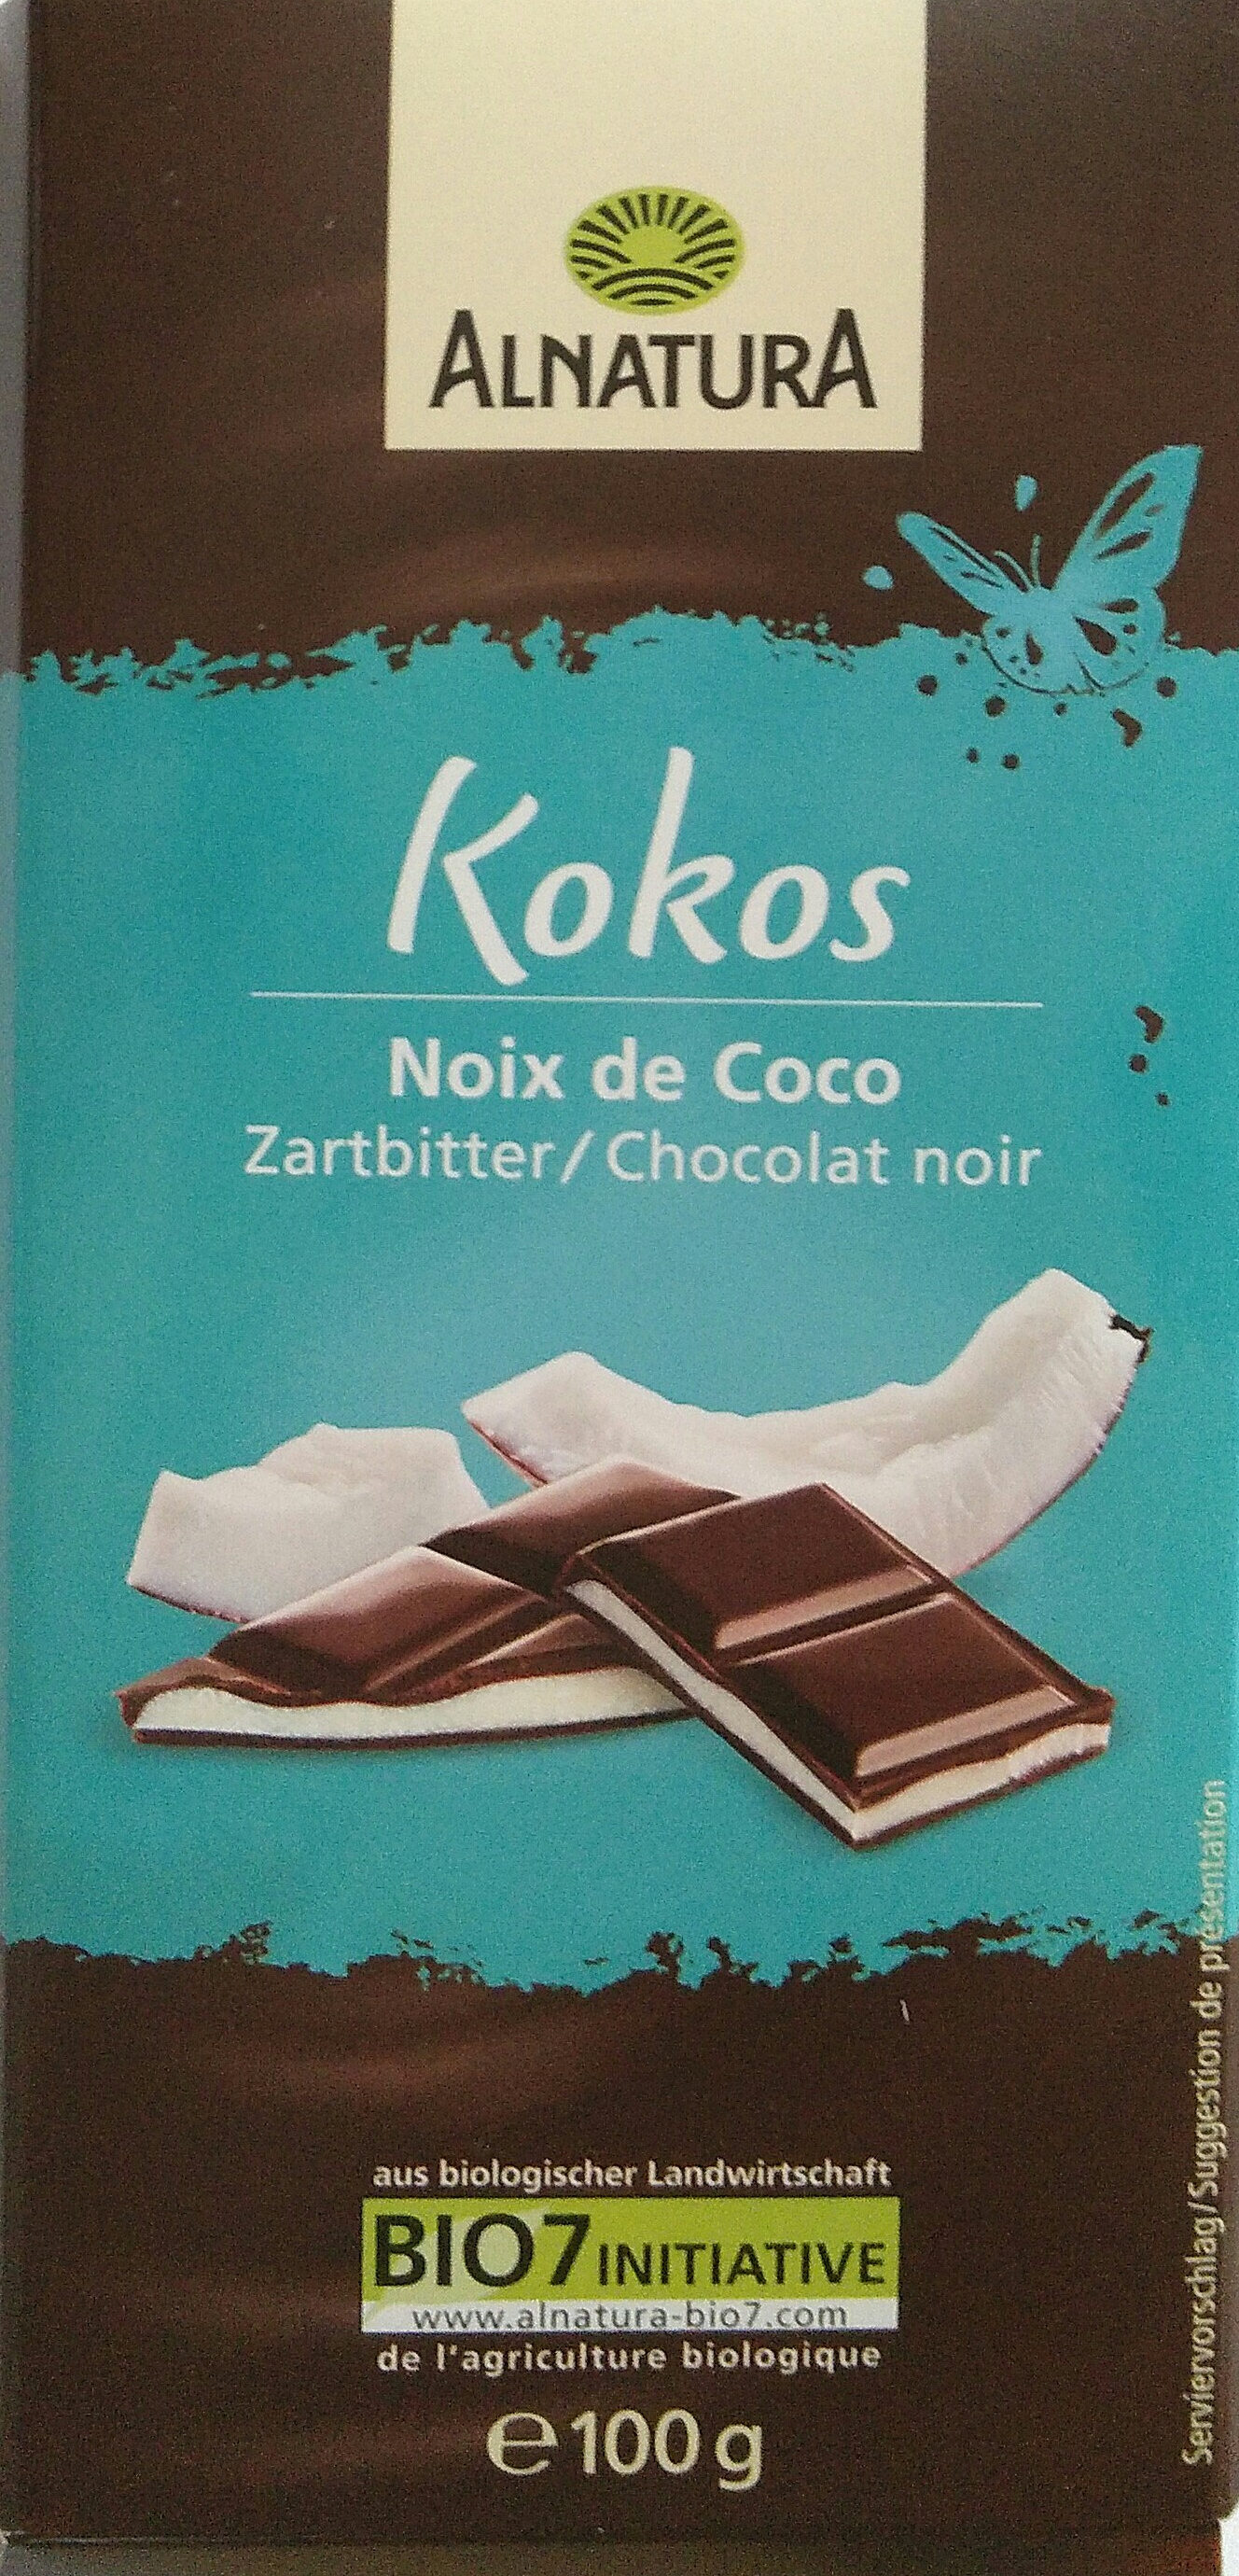 Zartbitter Kokos - Product - de